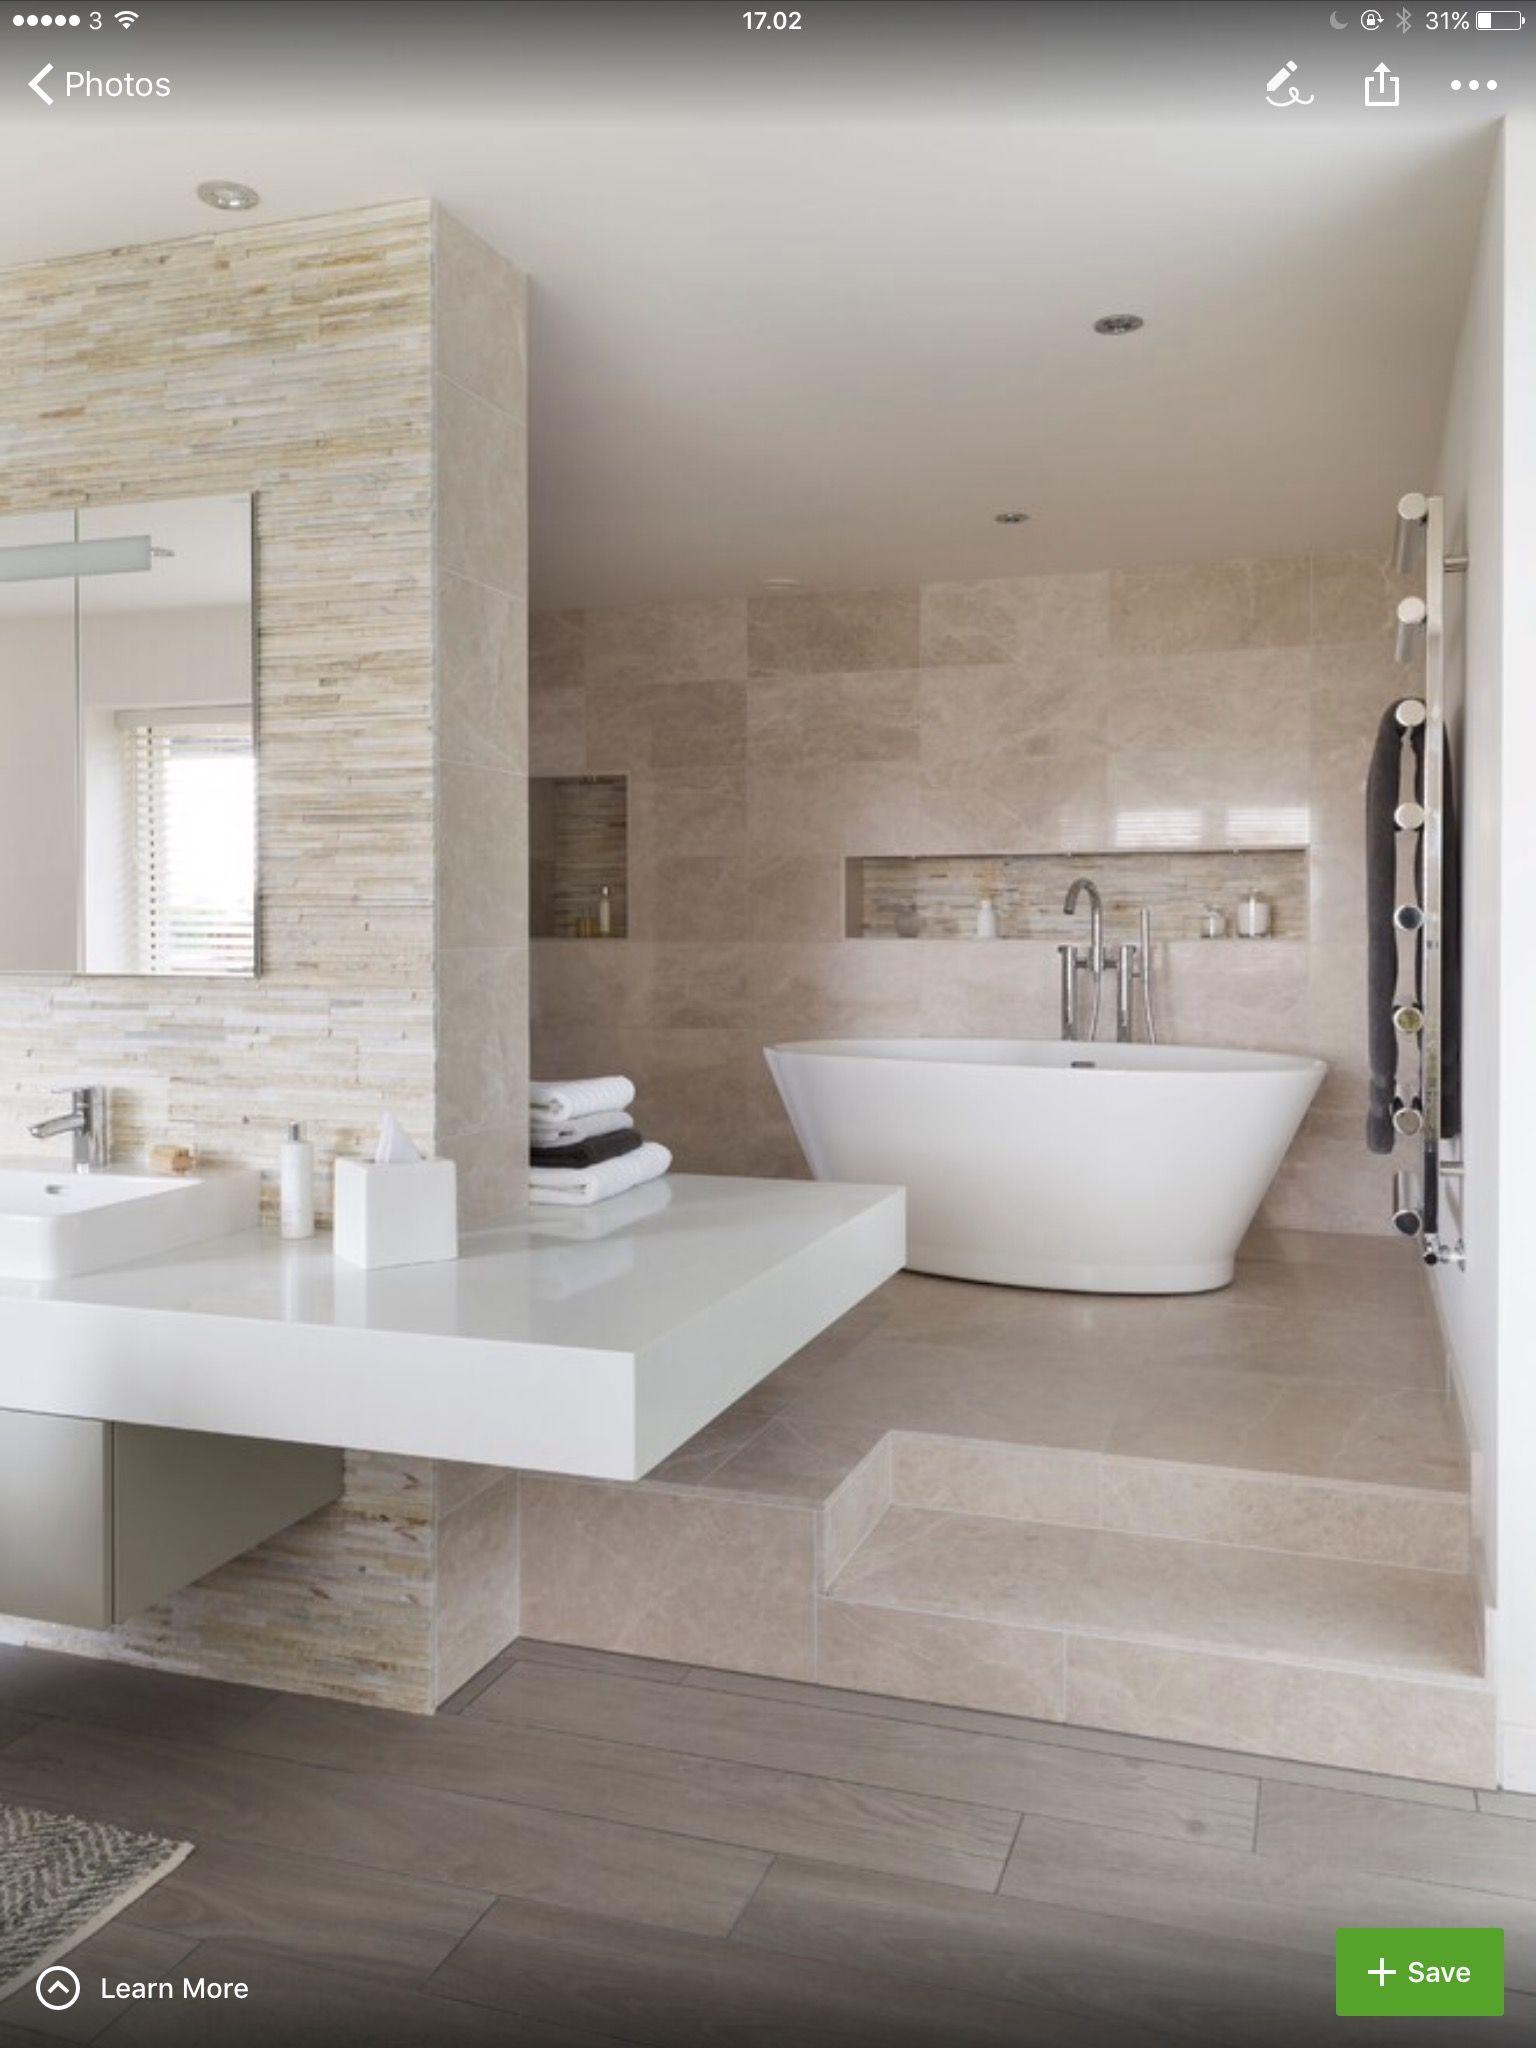 Pin by bärbel rehms on badezimmer pinterest tile ideas bathroom